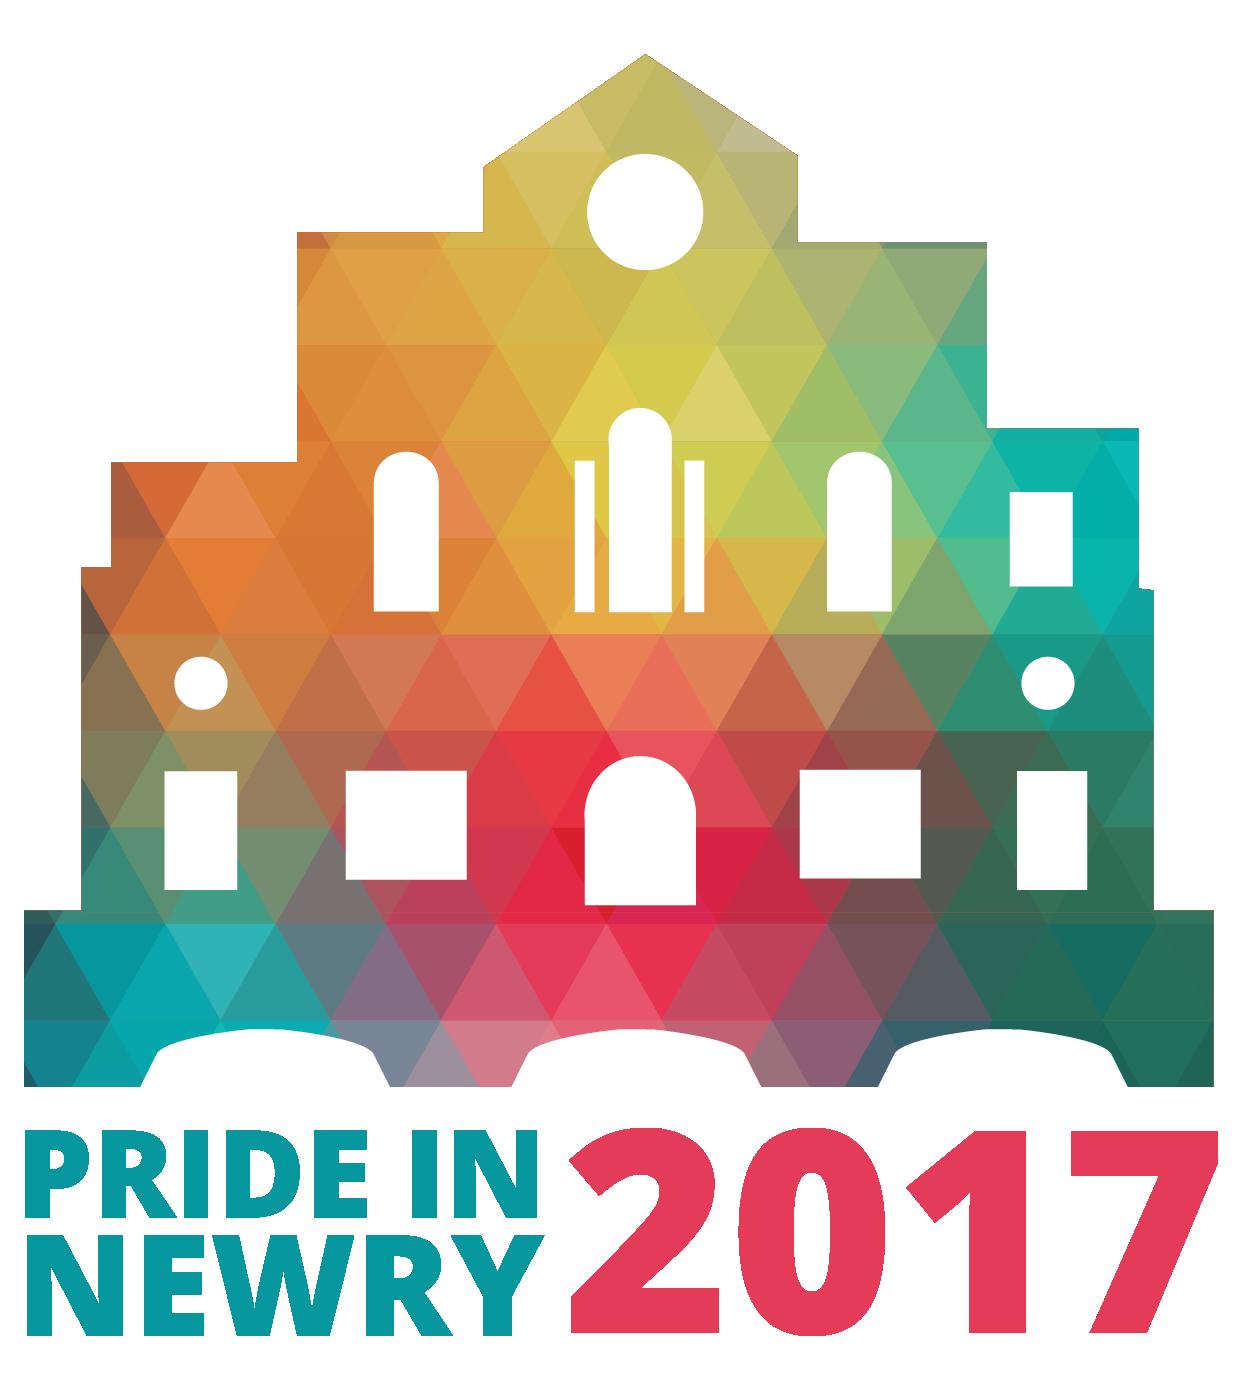 Pride In Newry 2017